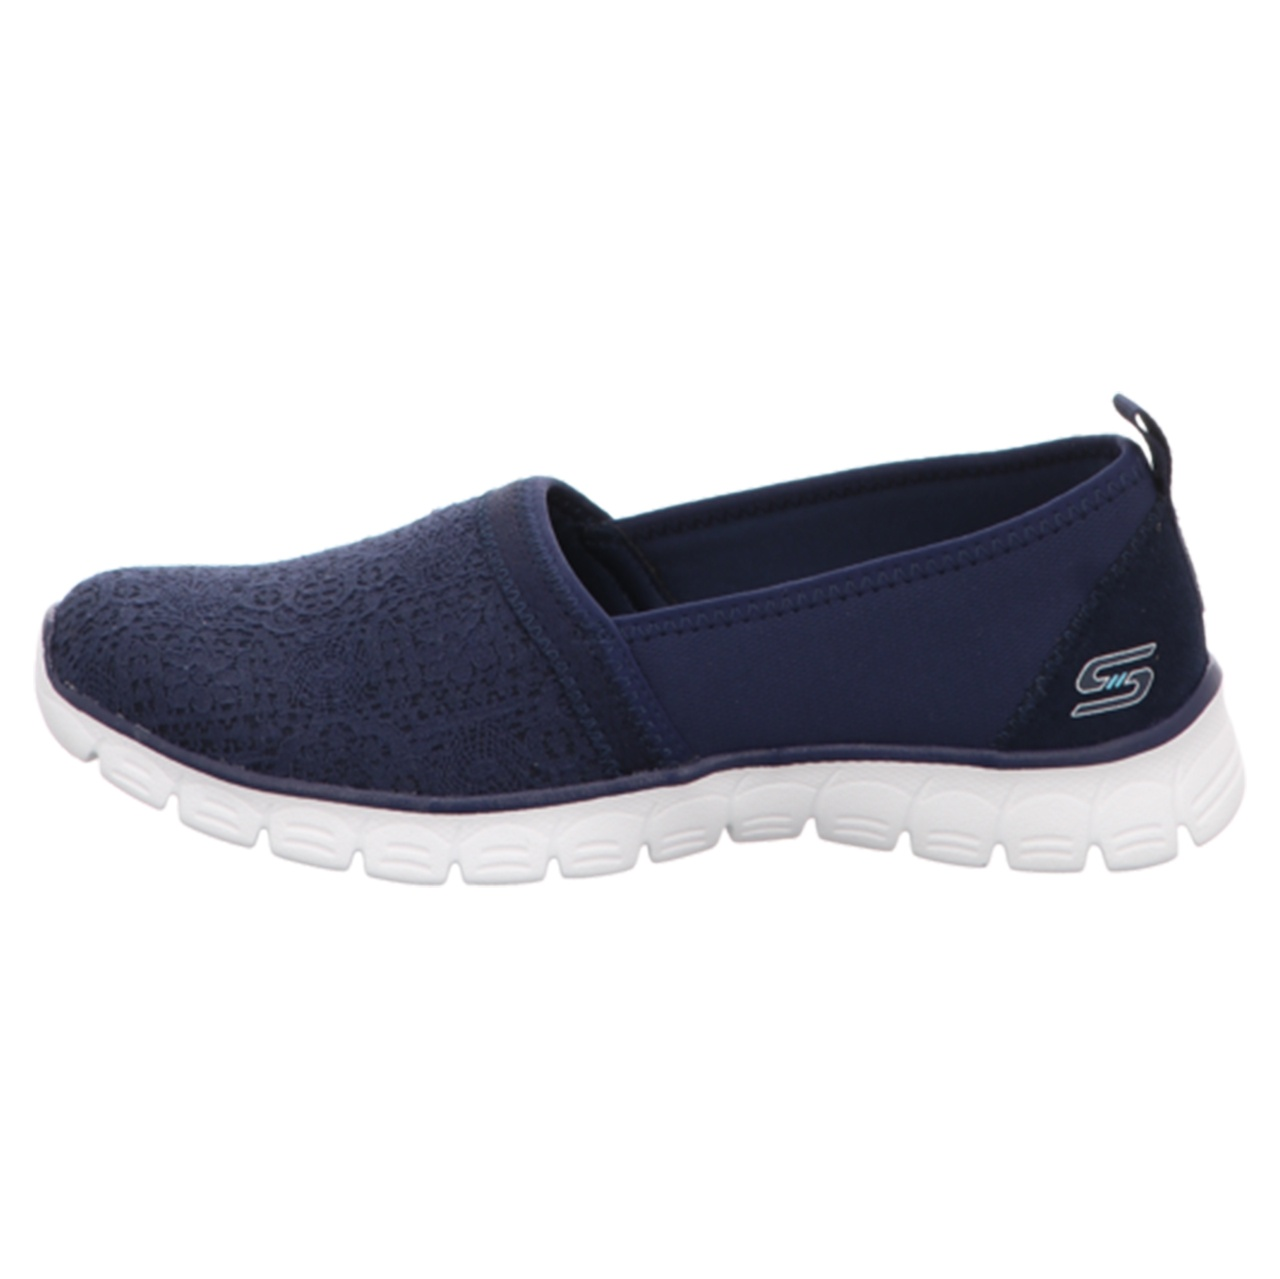 کفش مخصوص پیاده روی زنانه اسکچرز مدل MIRACLE 23441 NVY